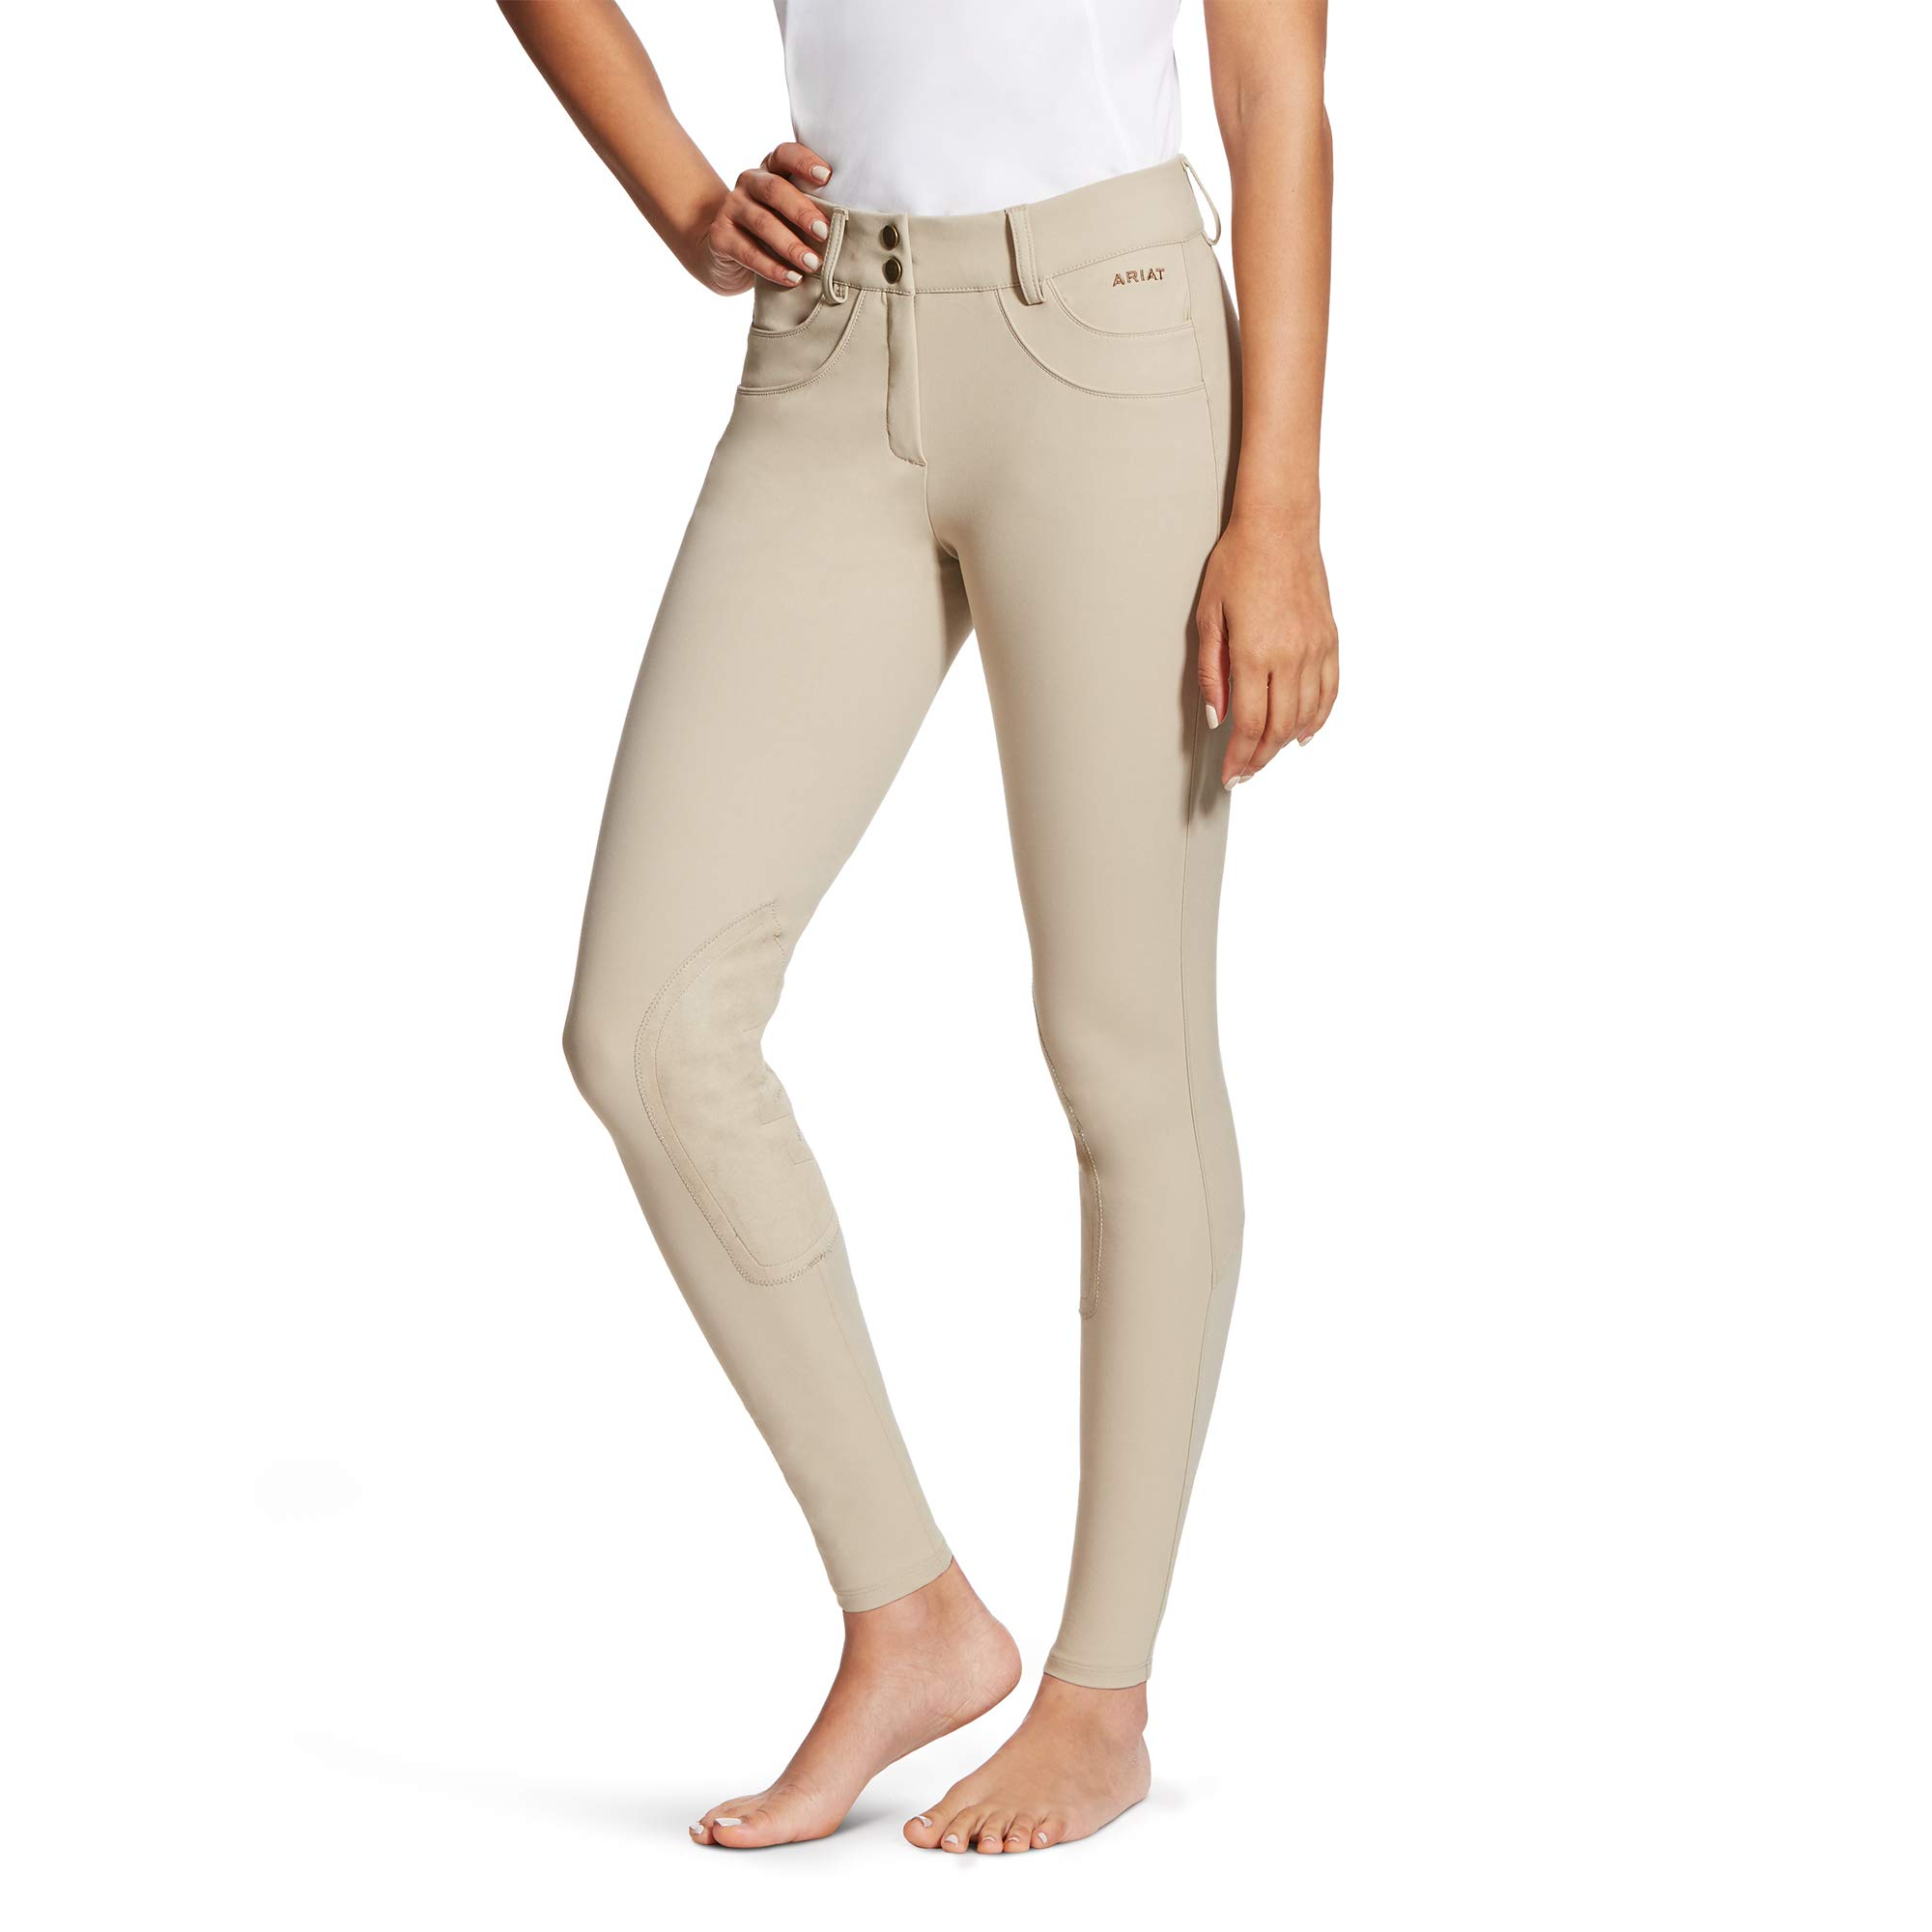 ARIAT Women's Olympia Knee Patch Breech Tan Size 24 Regular